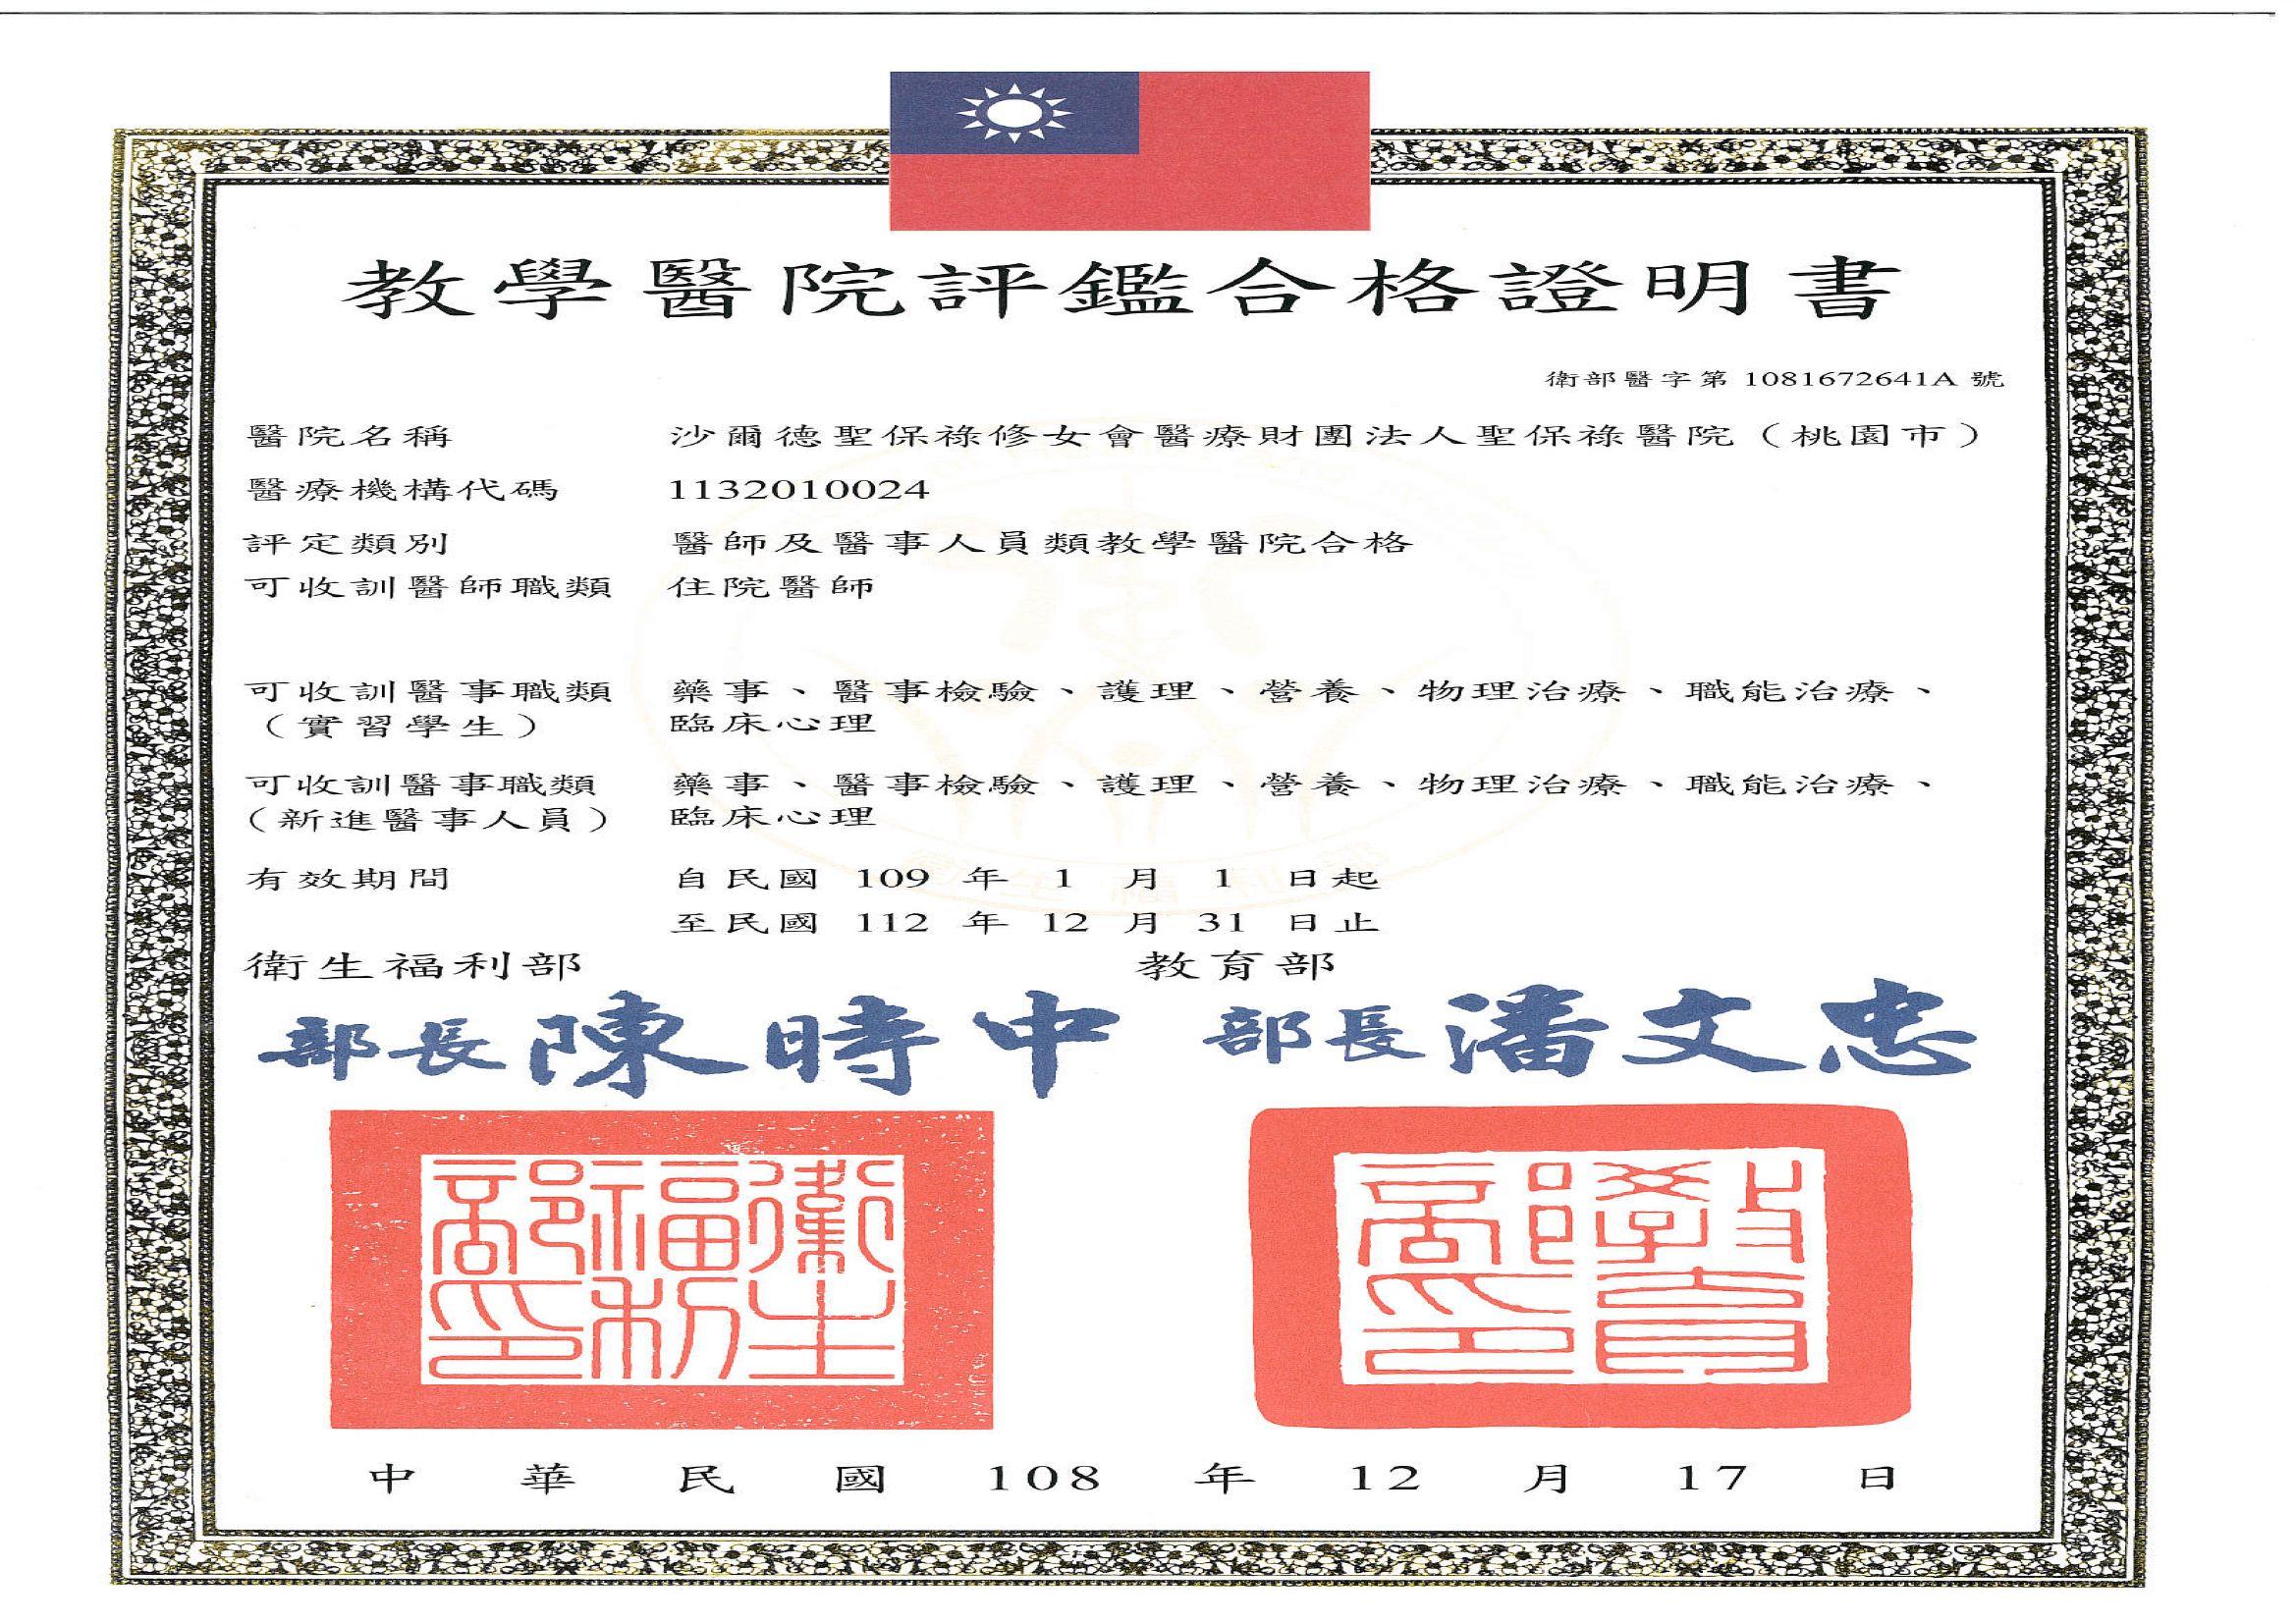 <ul> <li>12月17日教學醫院評鑑評定為「醫師及醫事人員類教學醫院合格」。</li> </ul>